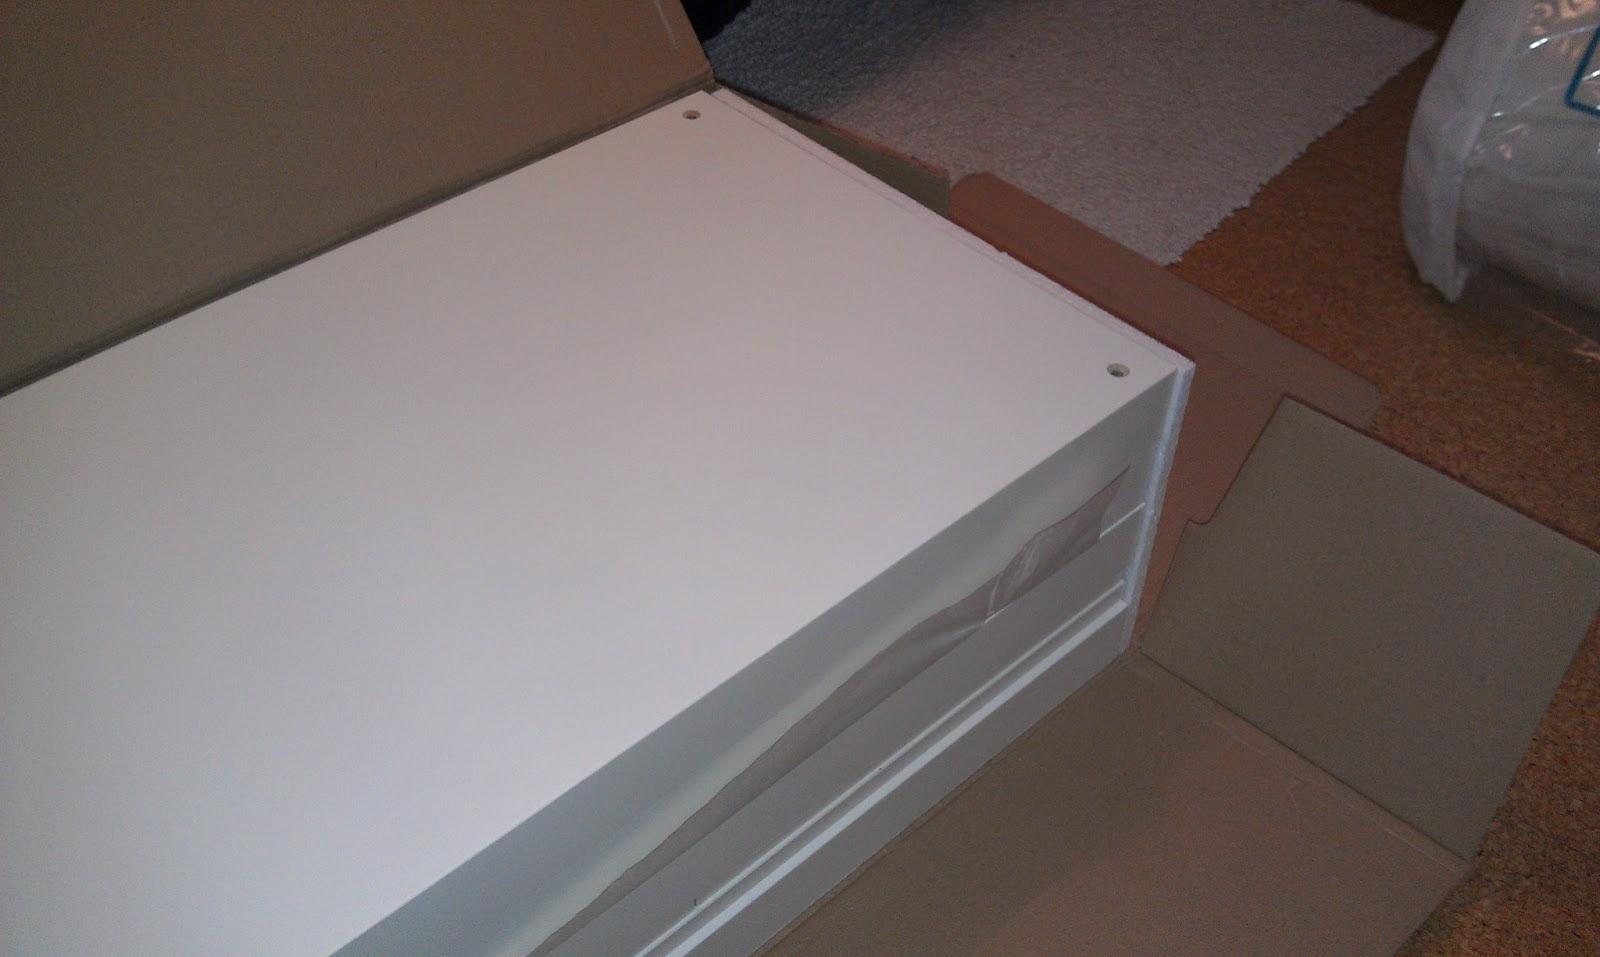 Selbst Ist Die Frau Oder Aufbau Eines Ikea Regals